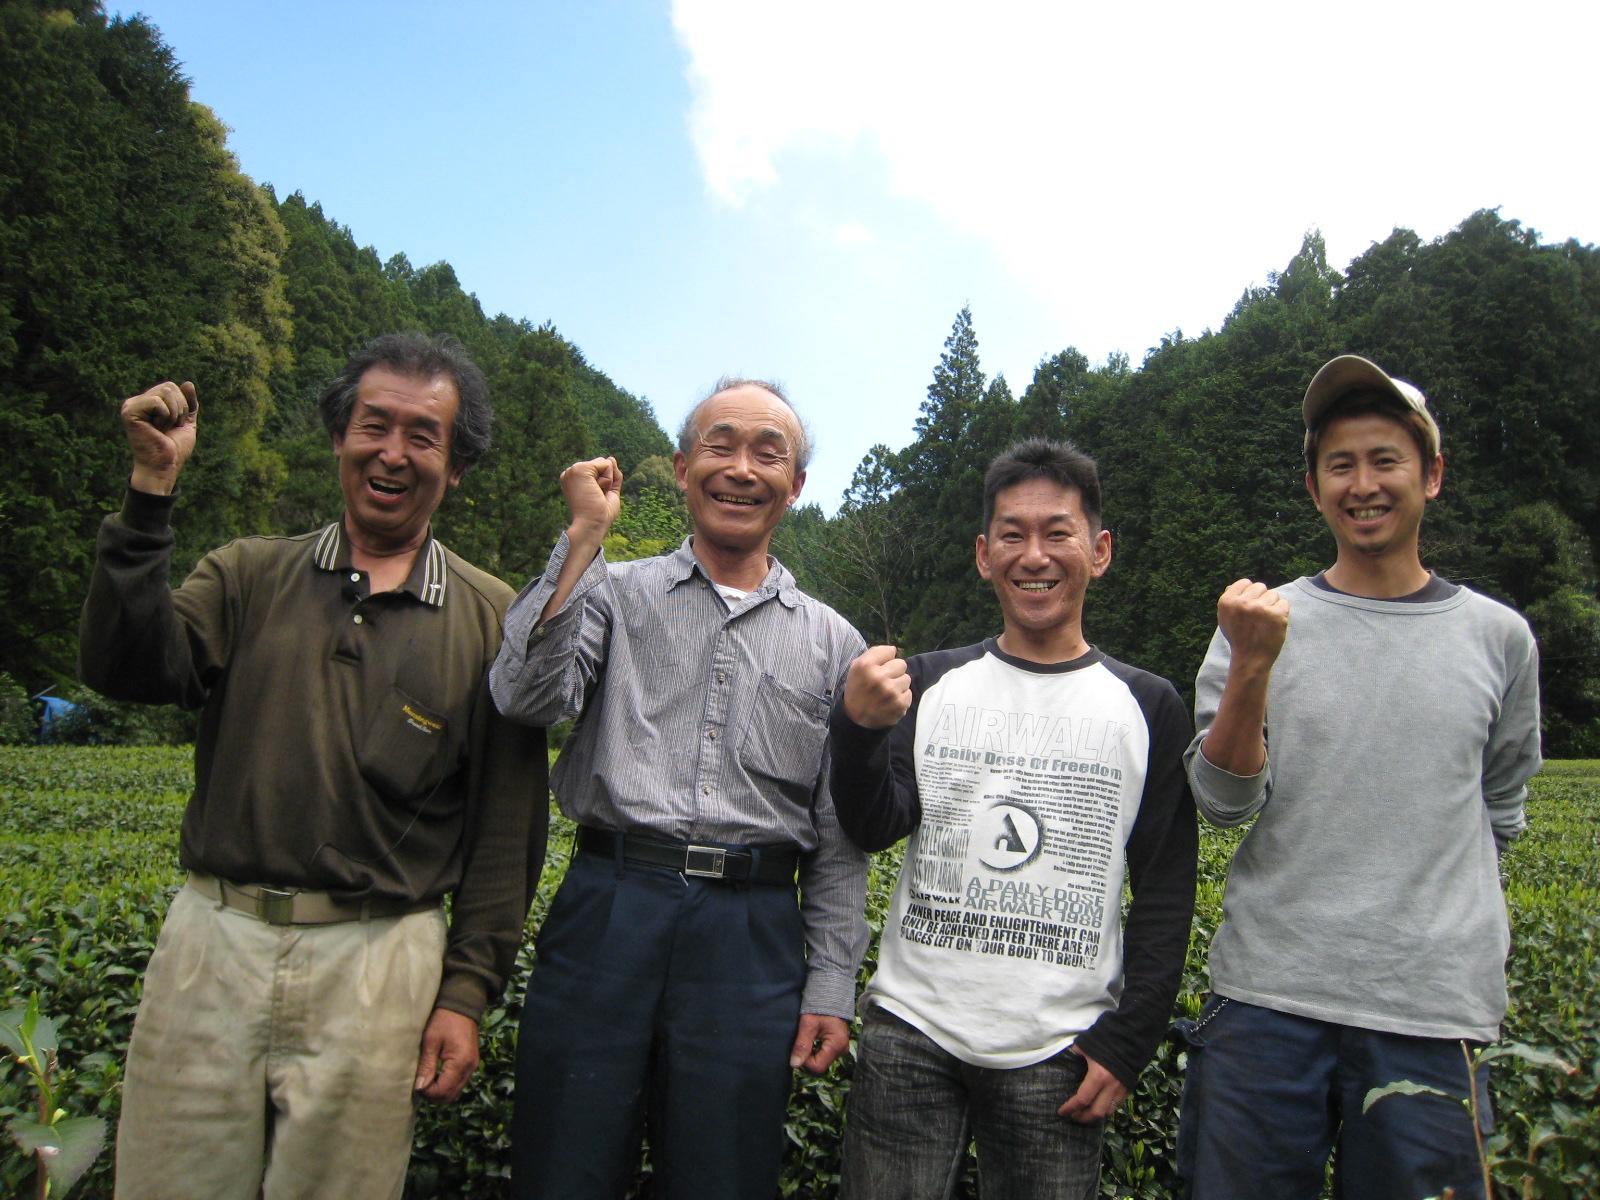 Members of the Shizuoka Organic Tea Farmers Union